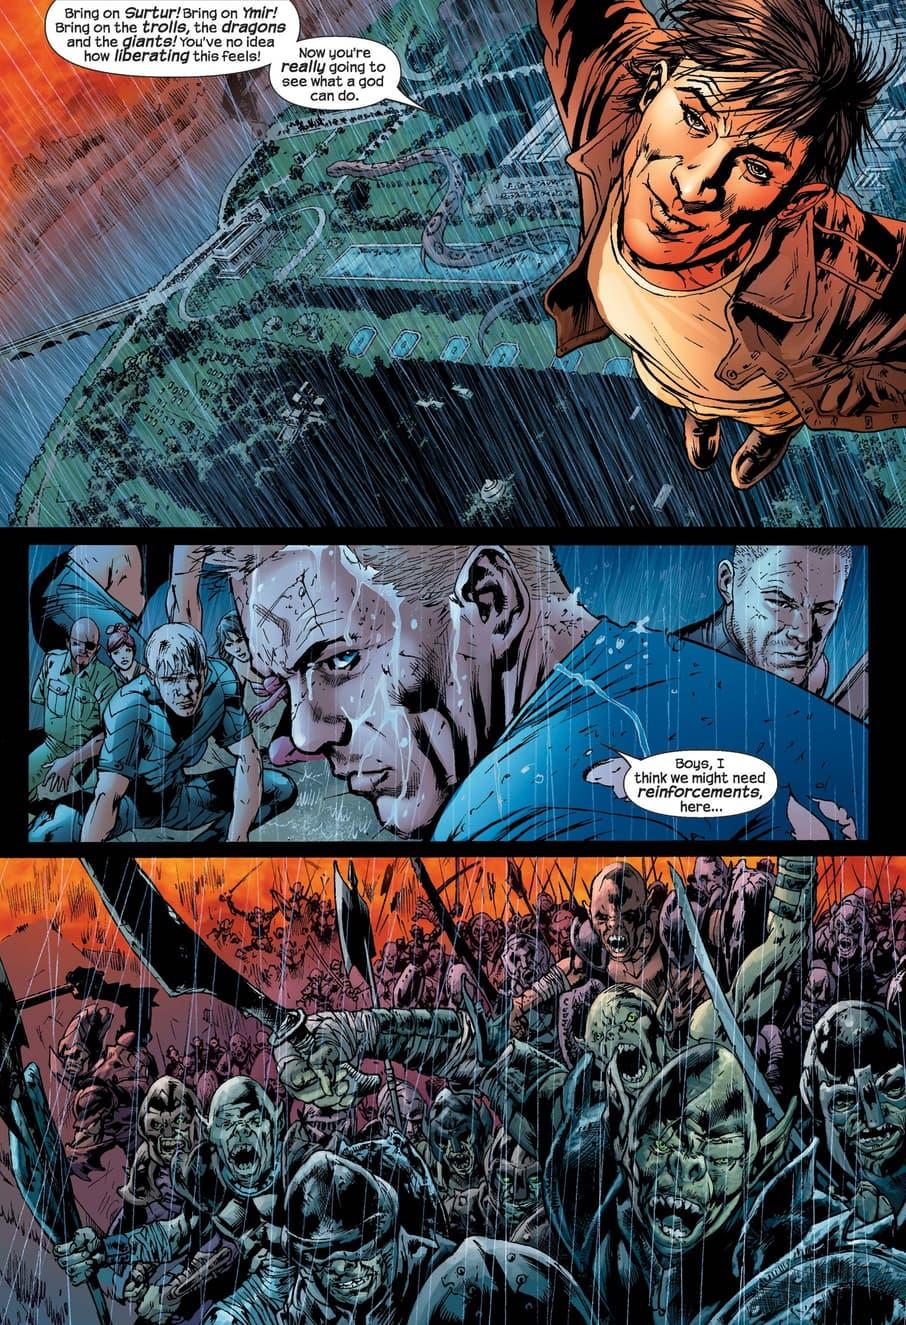 Ultimate Loki's true nature revealed in ULTIMATES 2 (2004) #13.